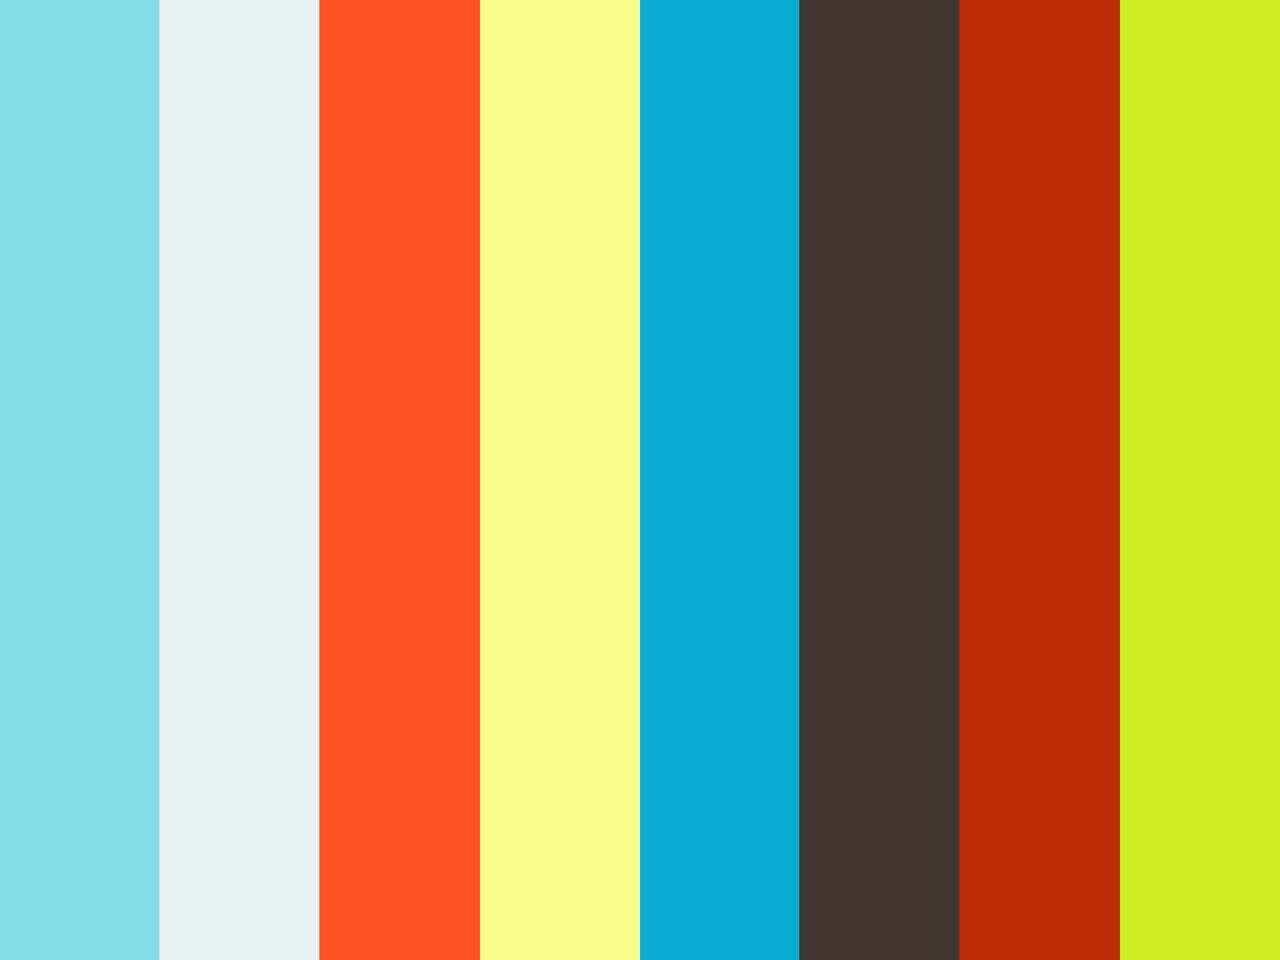 4 Oct 2017 – Erev Sukkot 5778 [2/3]